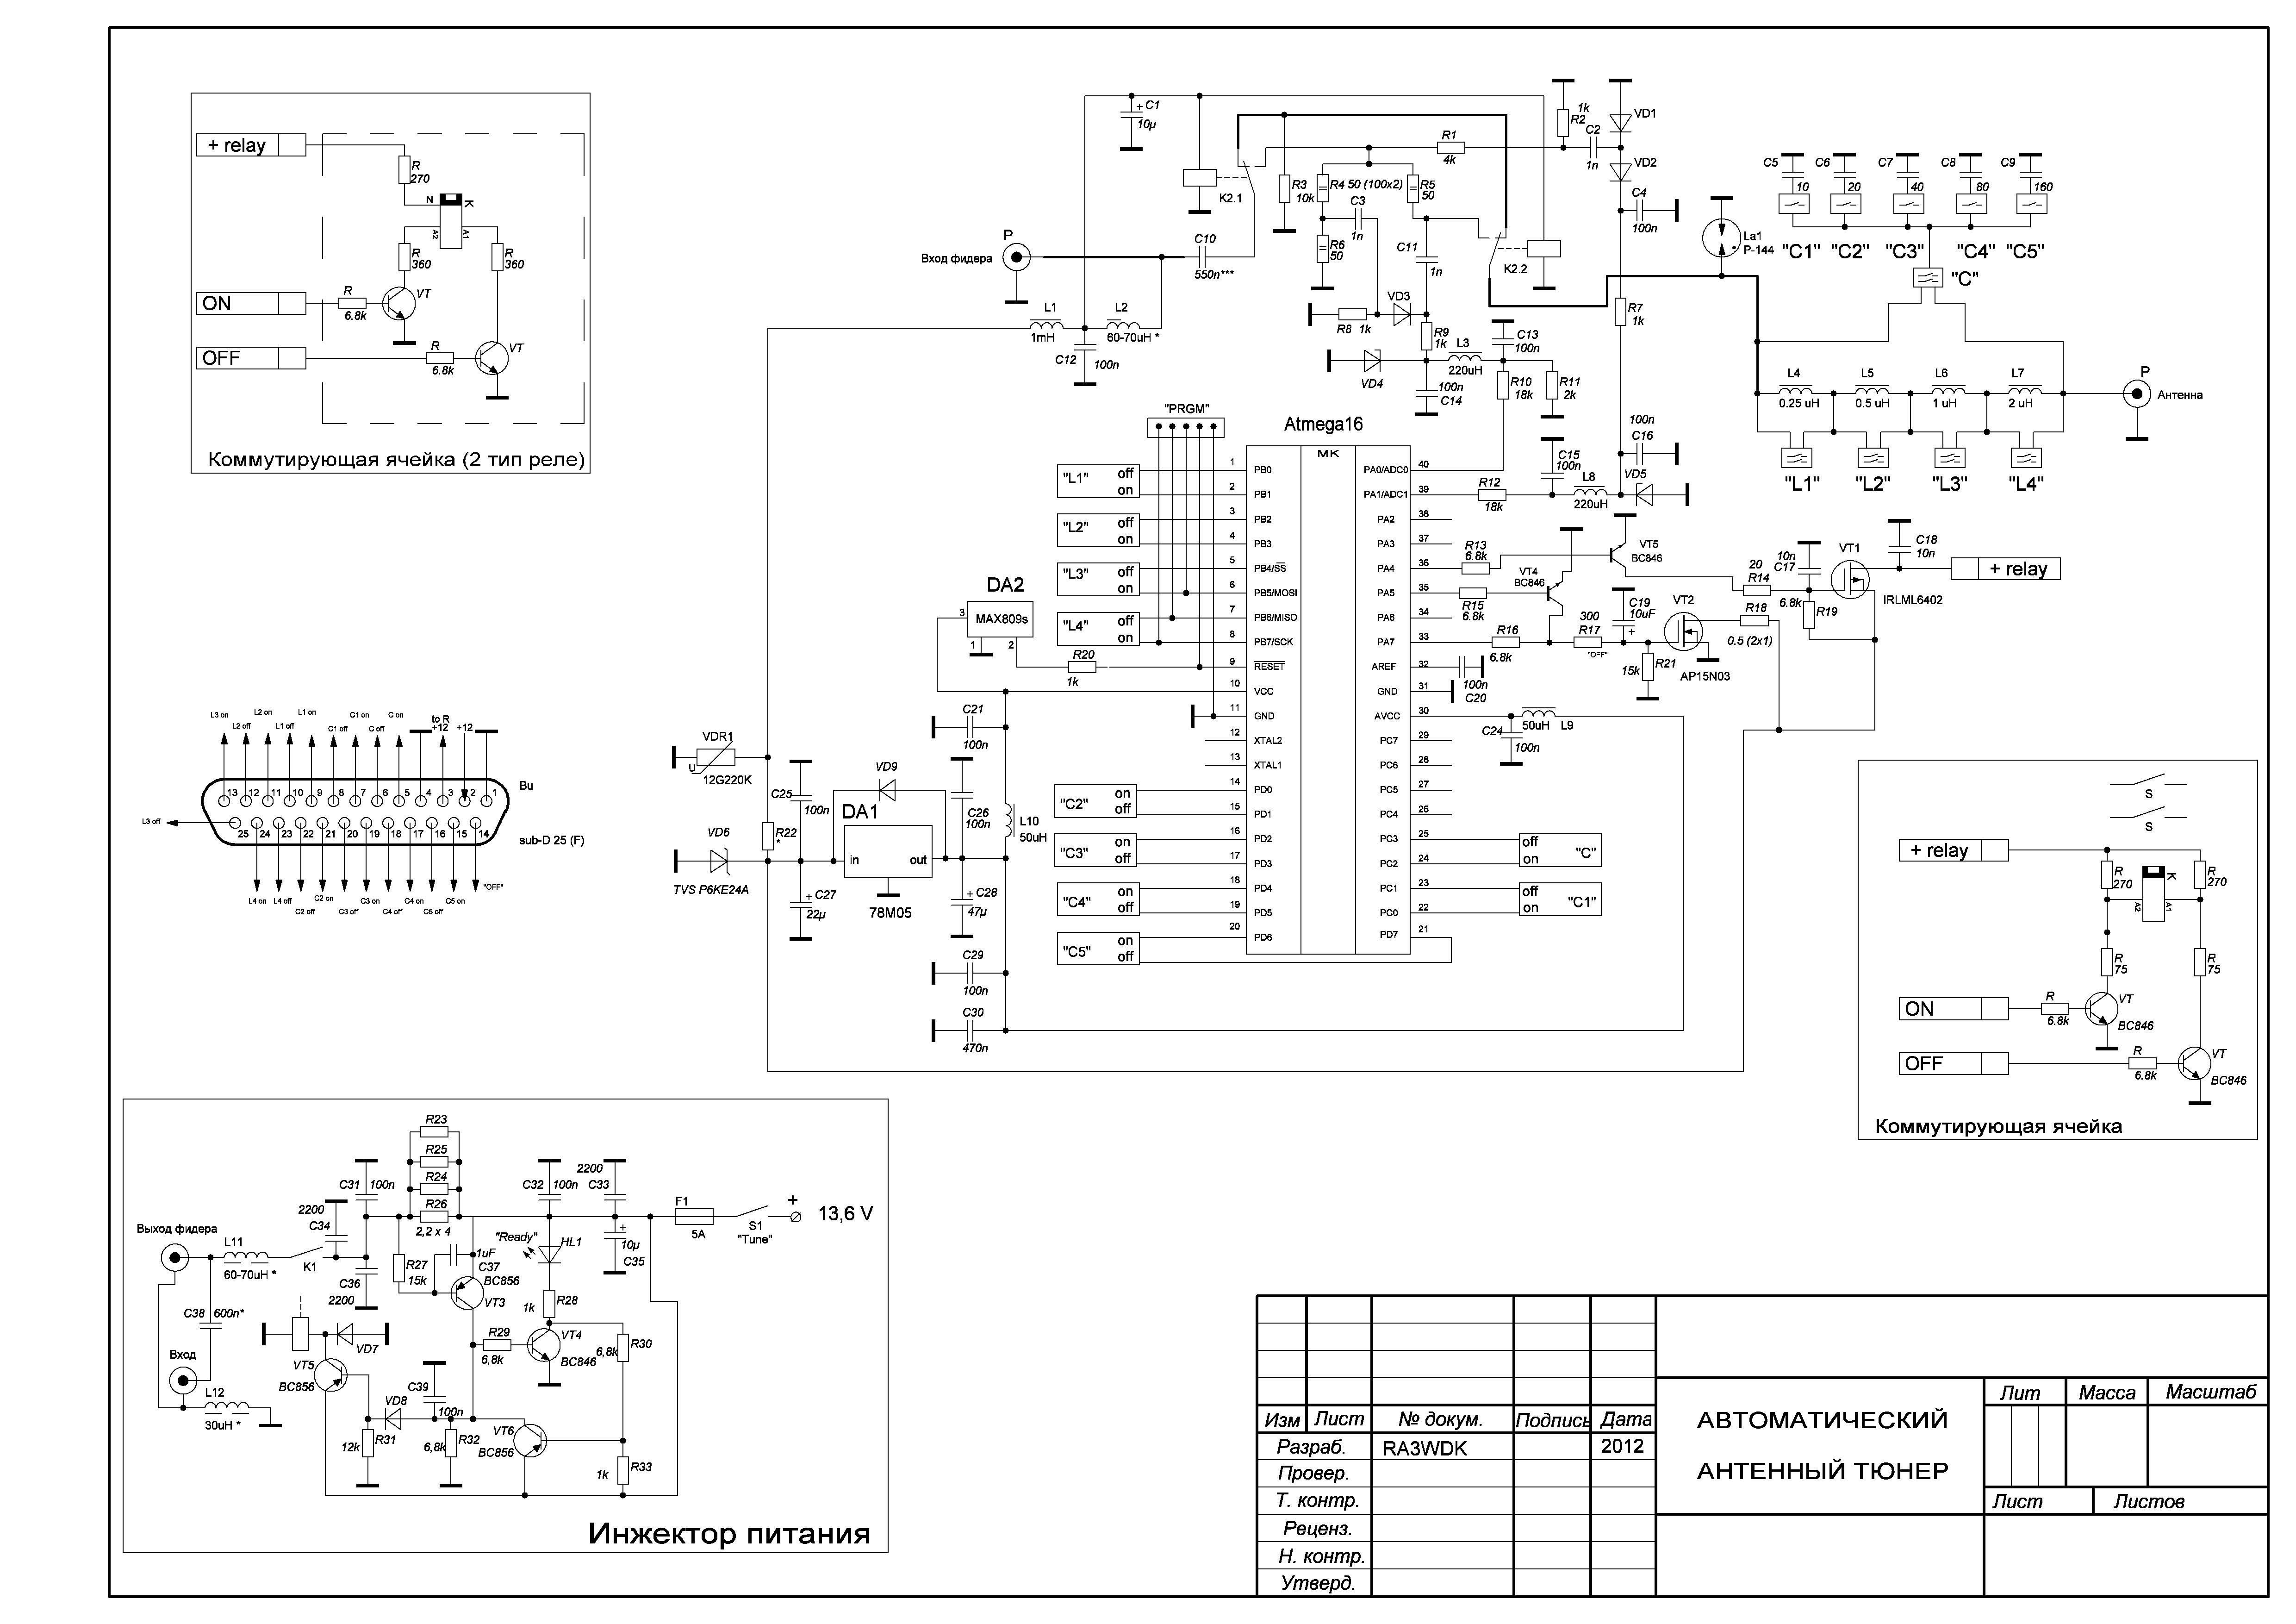 реализация схем на attiny26 16pu описание на русском